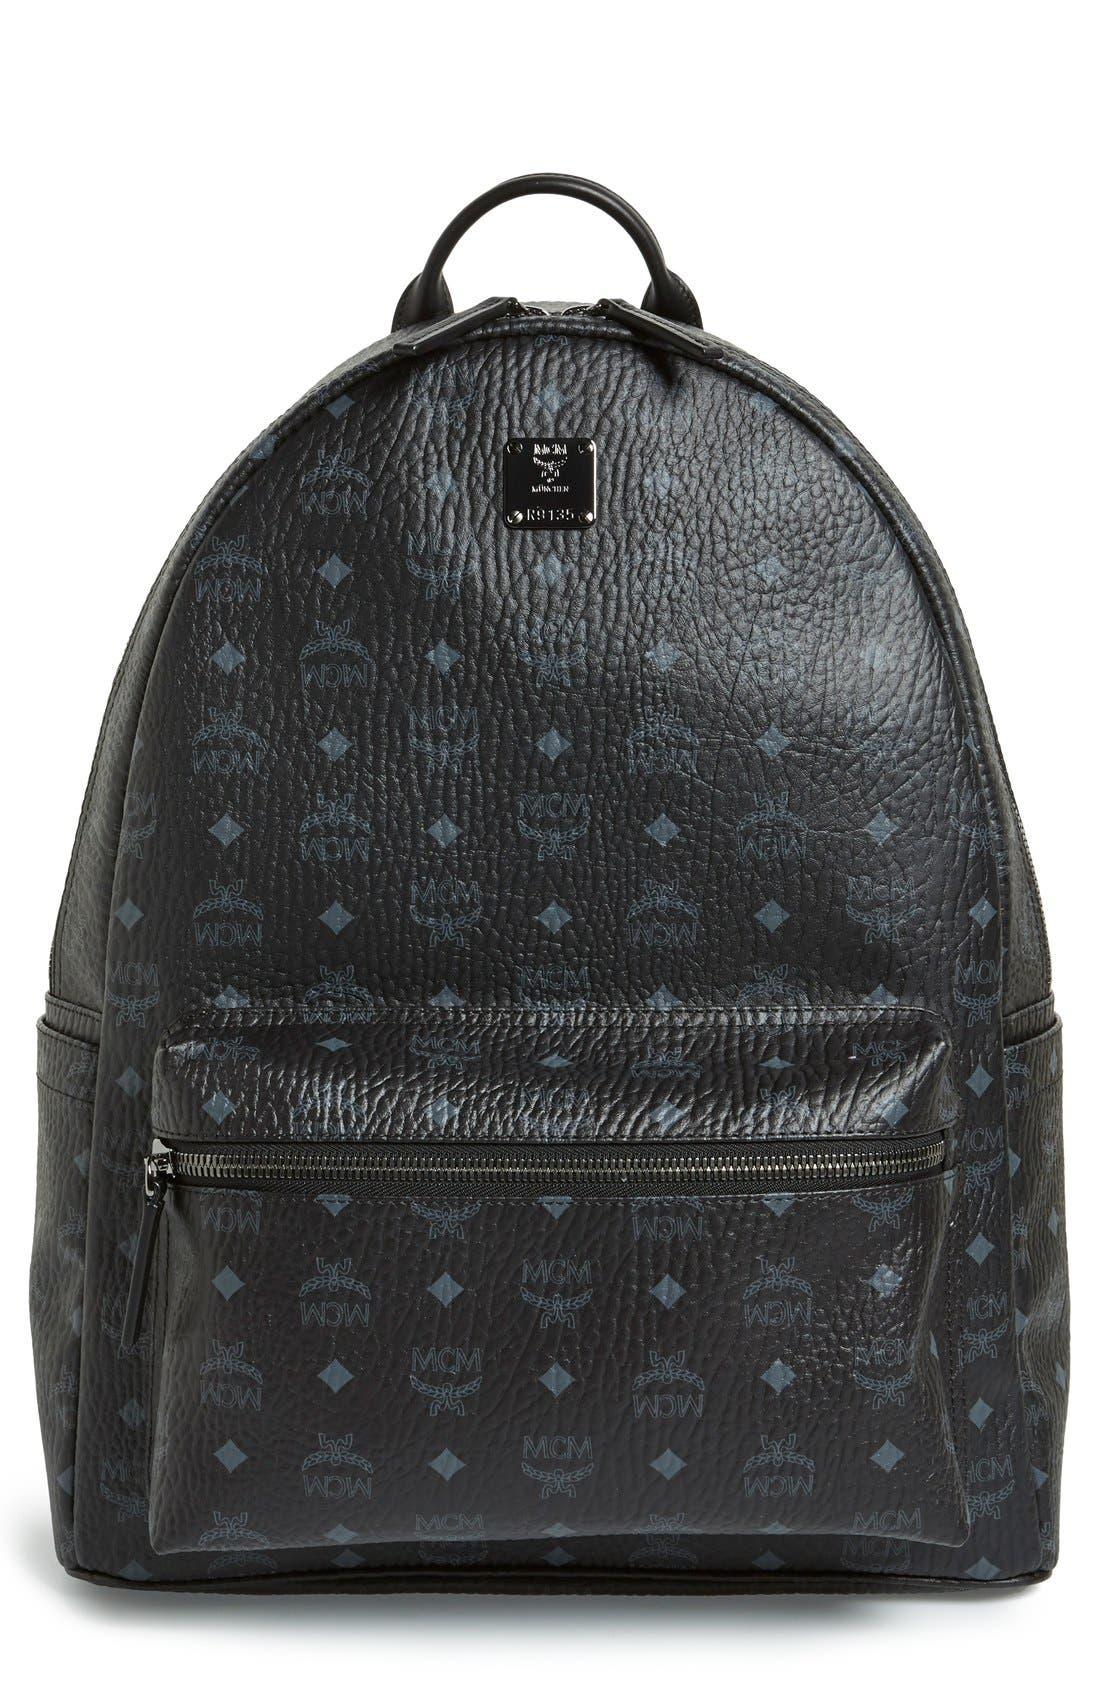 Alternate Image 1 Selected - MCM 'Large Stark' Backpack